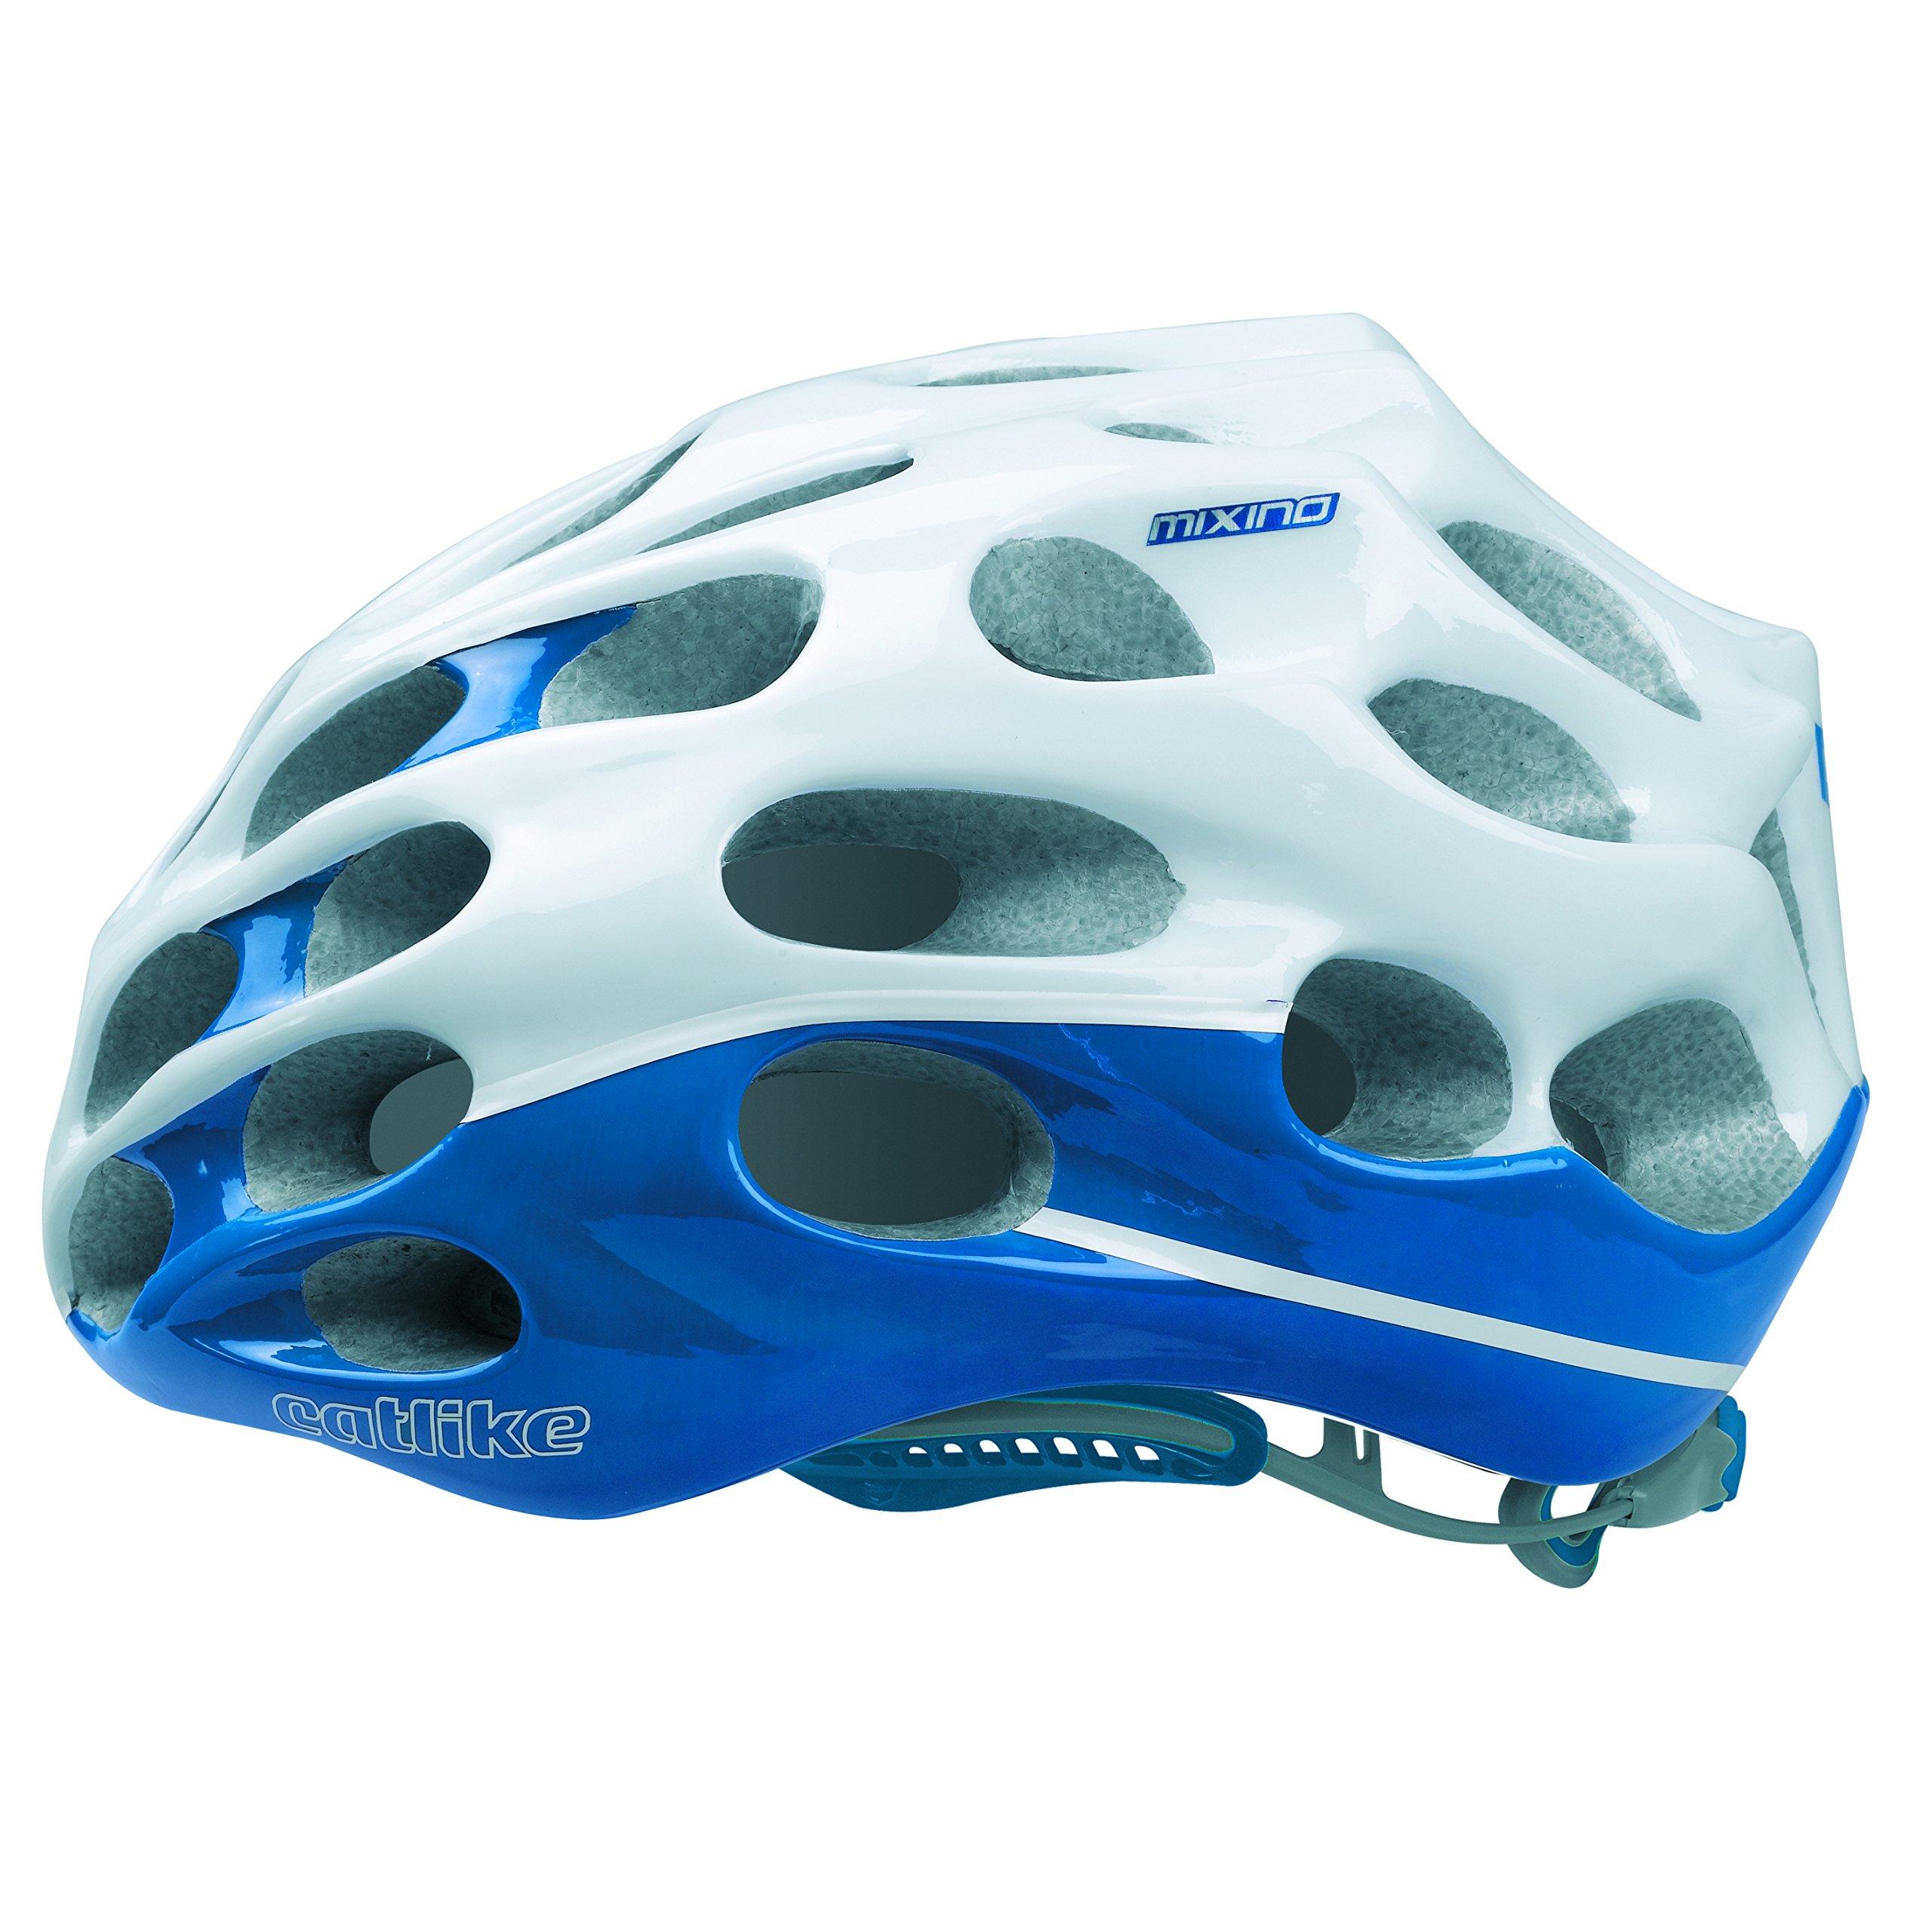 Catlike Mixino bicicleta casco Dual Flow tamaño s (52 – 54 cm) CES ...